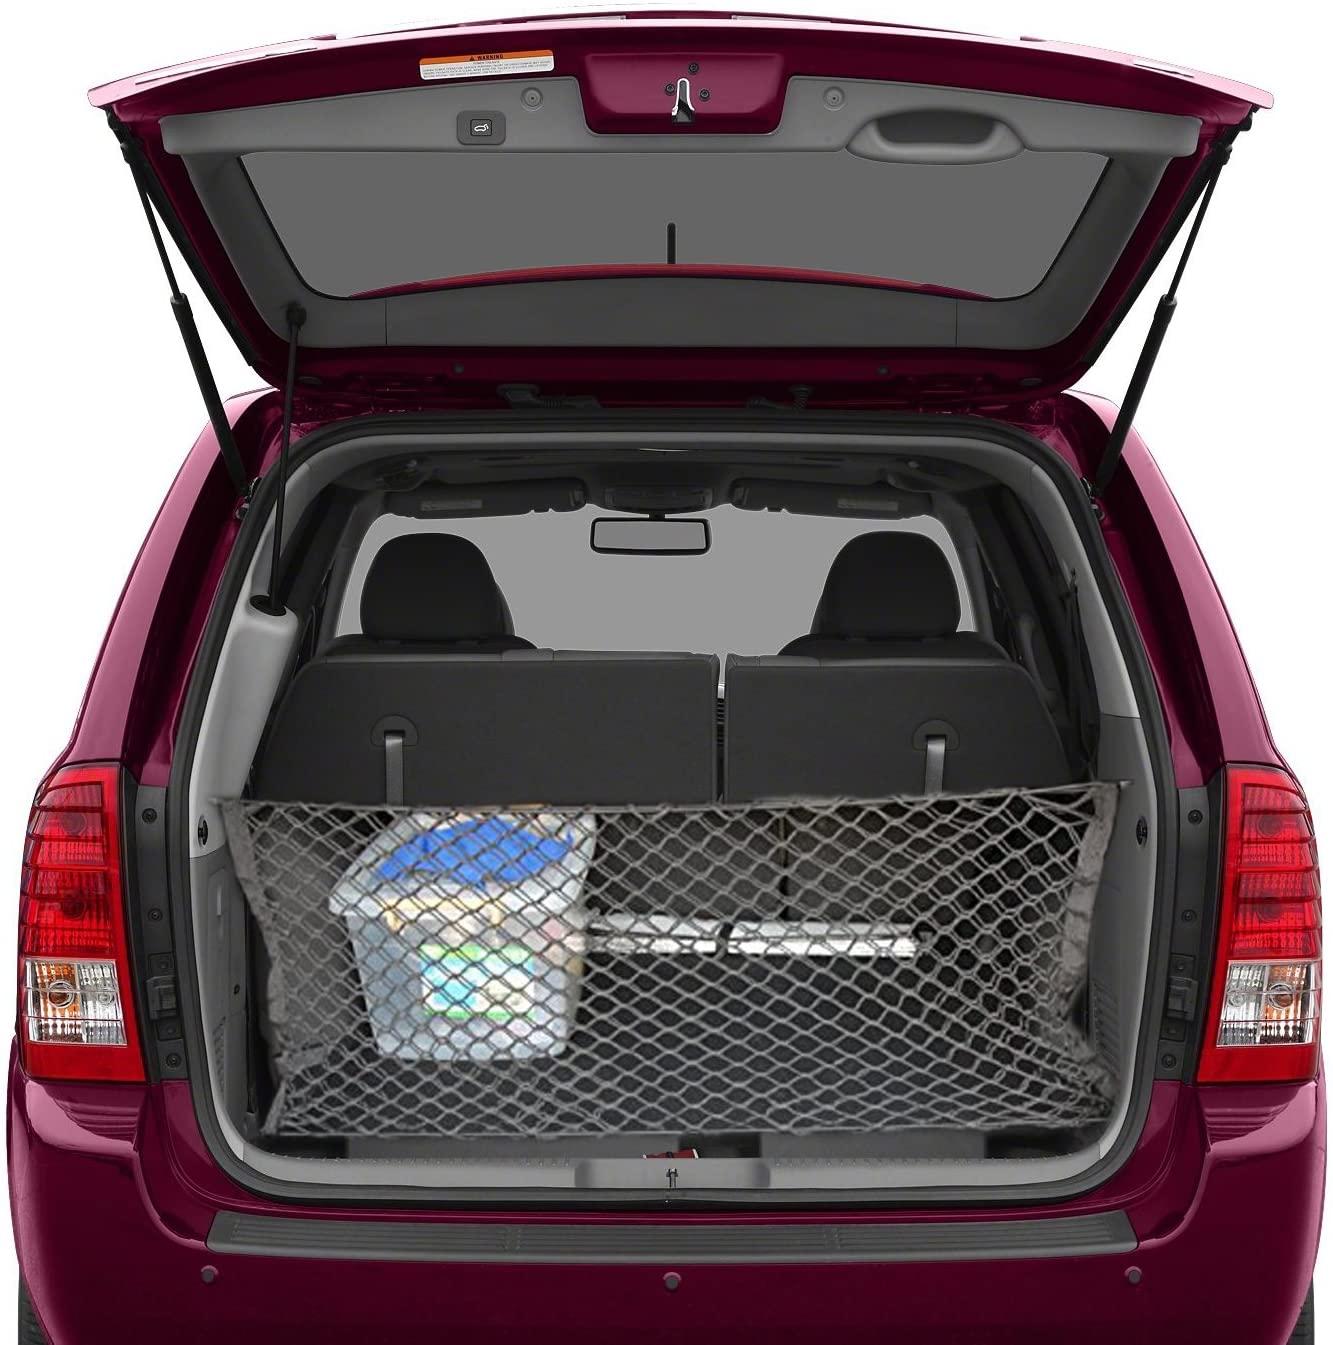 lebogner Trunk Storage Net Car Trunk Organizer, Mesh Net Hammock Cargo Storage Vehicle Organizer with 3 Mounting Options, Premium Quality Universal Fit Car Organizer